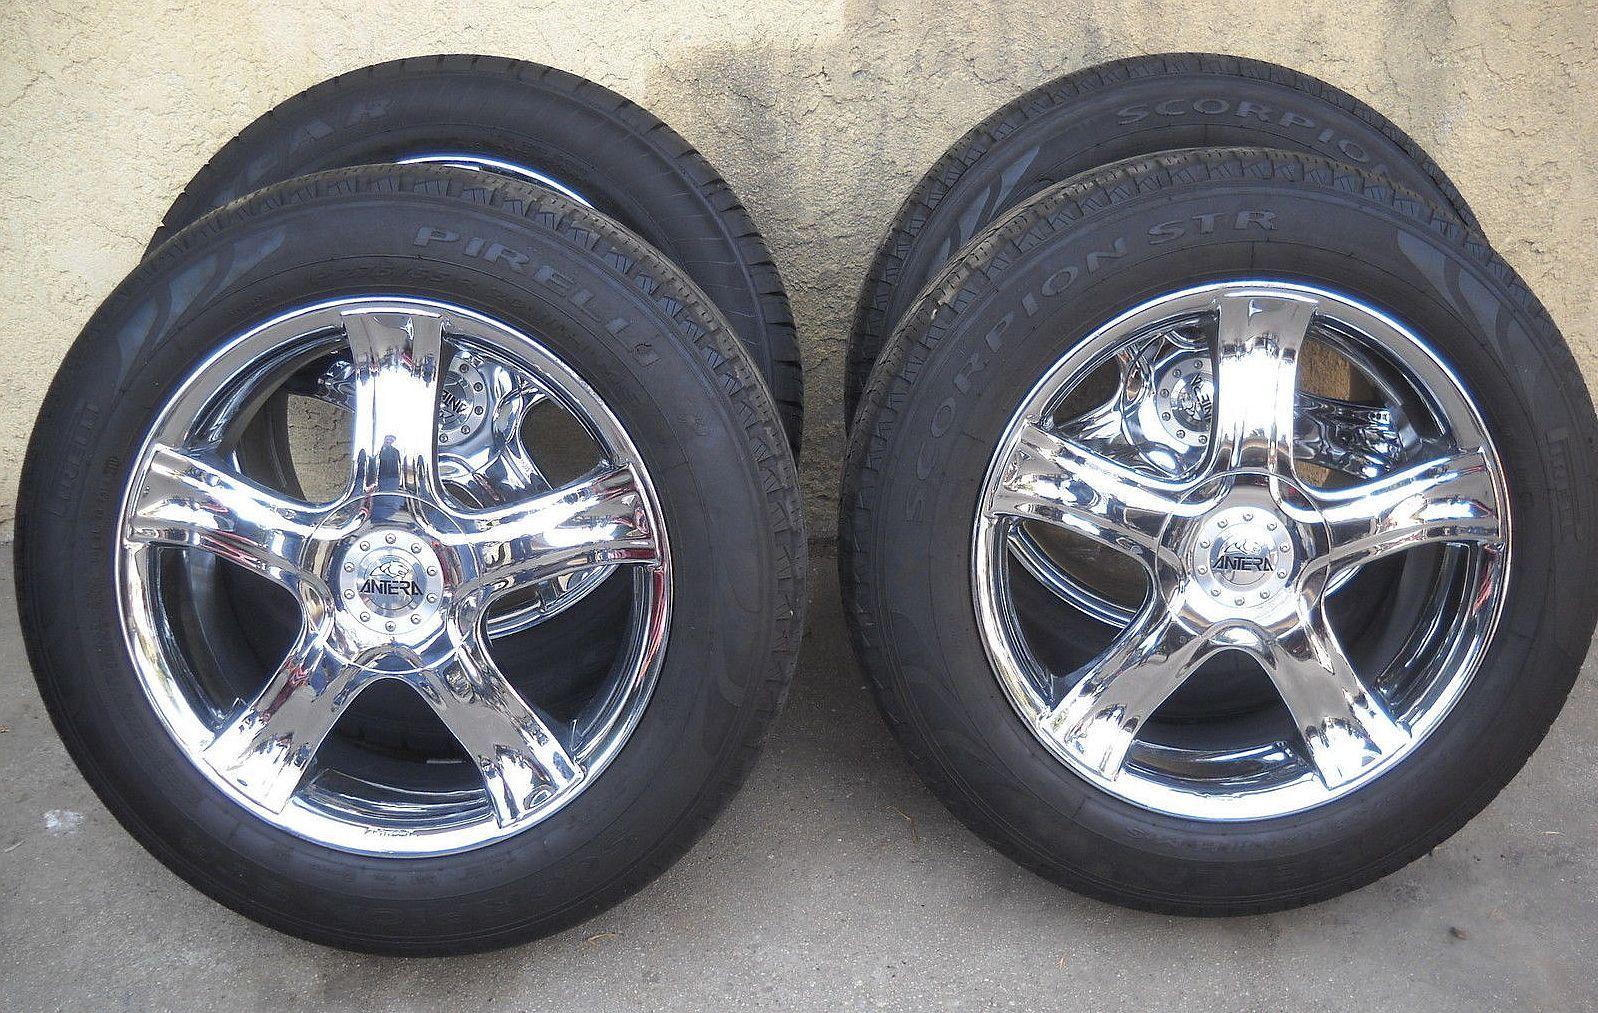 Antera Rims Pre Owned Model 235 20 Inch Chrome Wheels Mustang Wheels Alloy Wheels Cars Alloy Wheel [ 1013 x 1598 Pixel ]